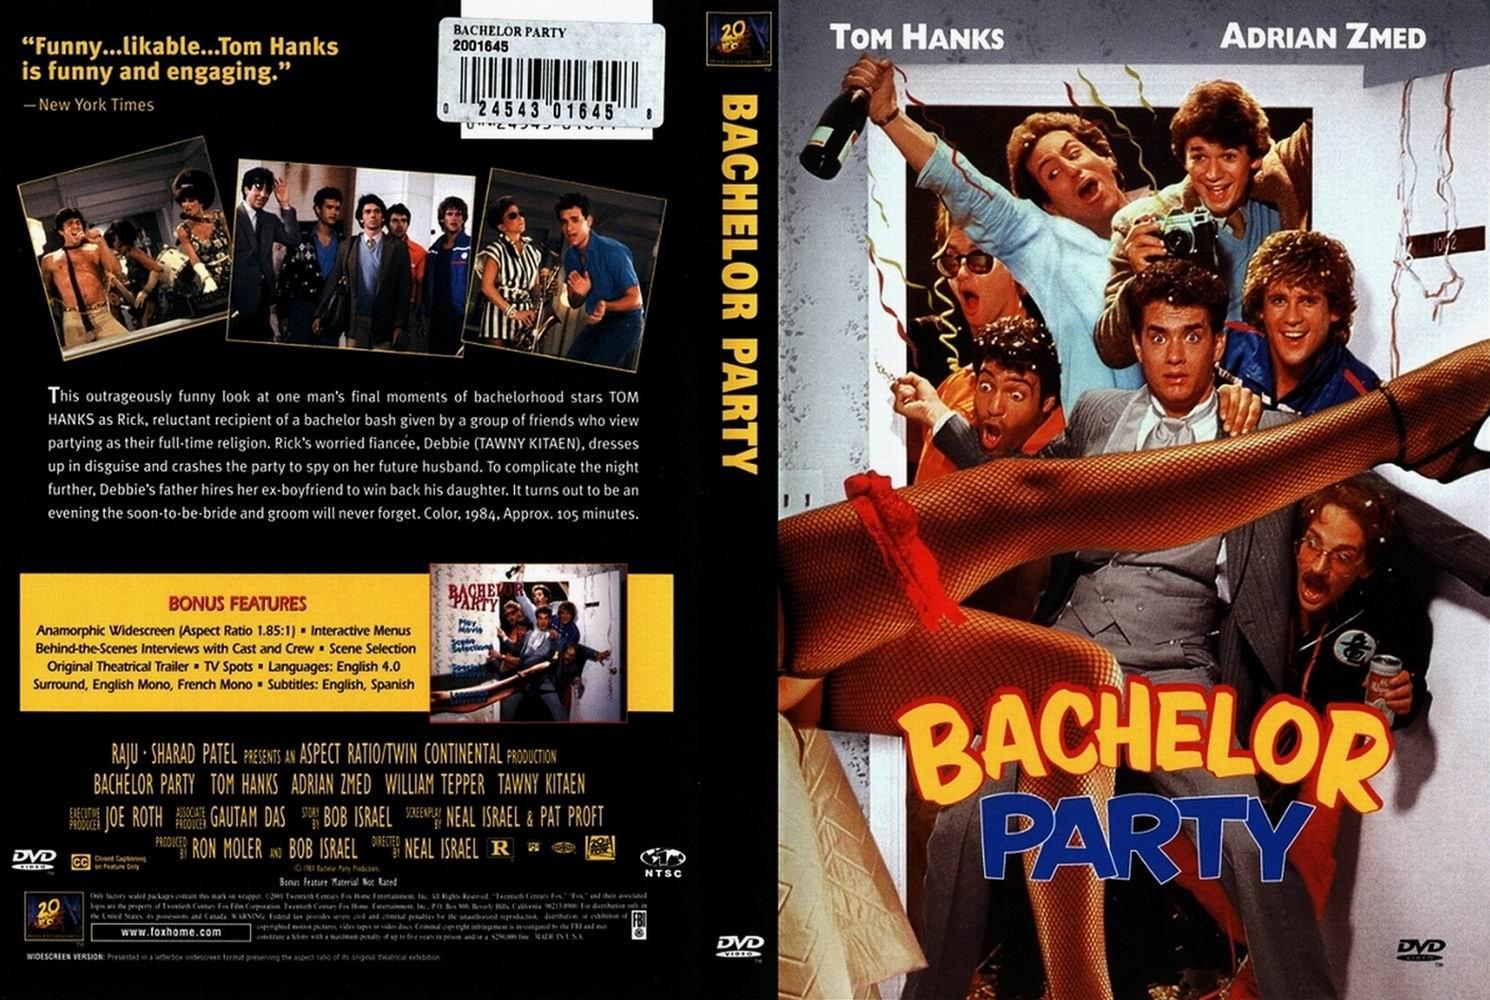 Bachelor%2BParty%2B(1984)%2Bh Πρεμιερα:4 April 1979 (USA) Γλωσσα:English Διαρκεια:121 min more info:The ...